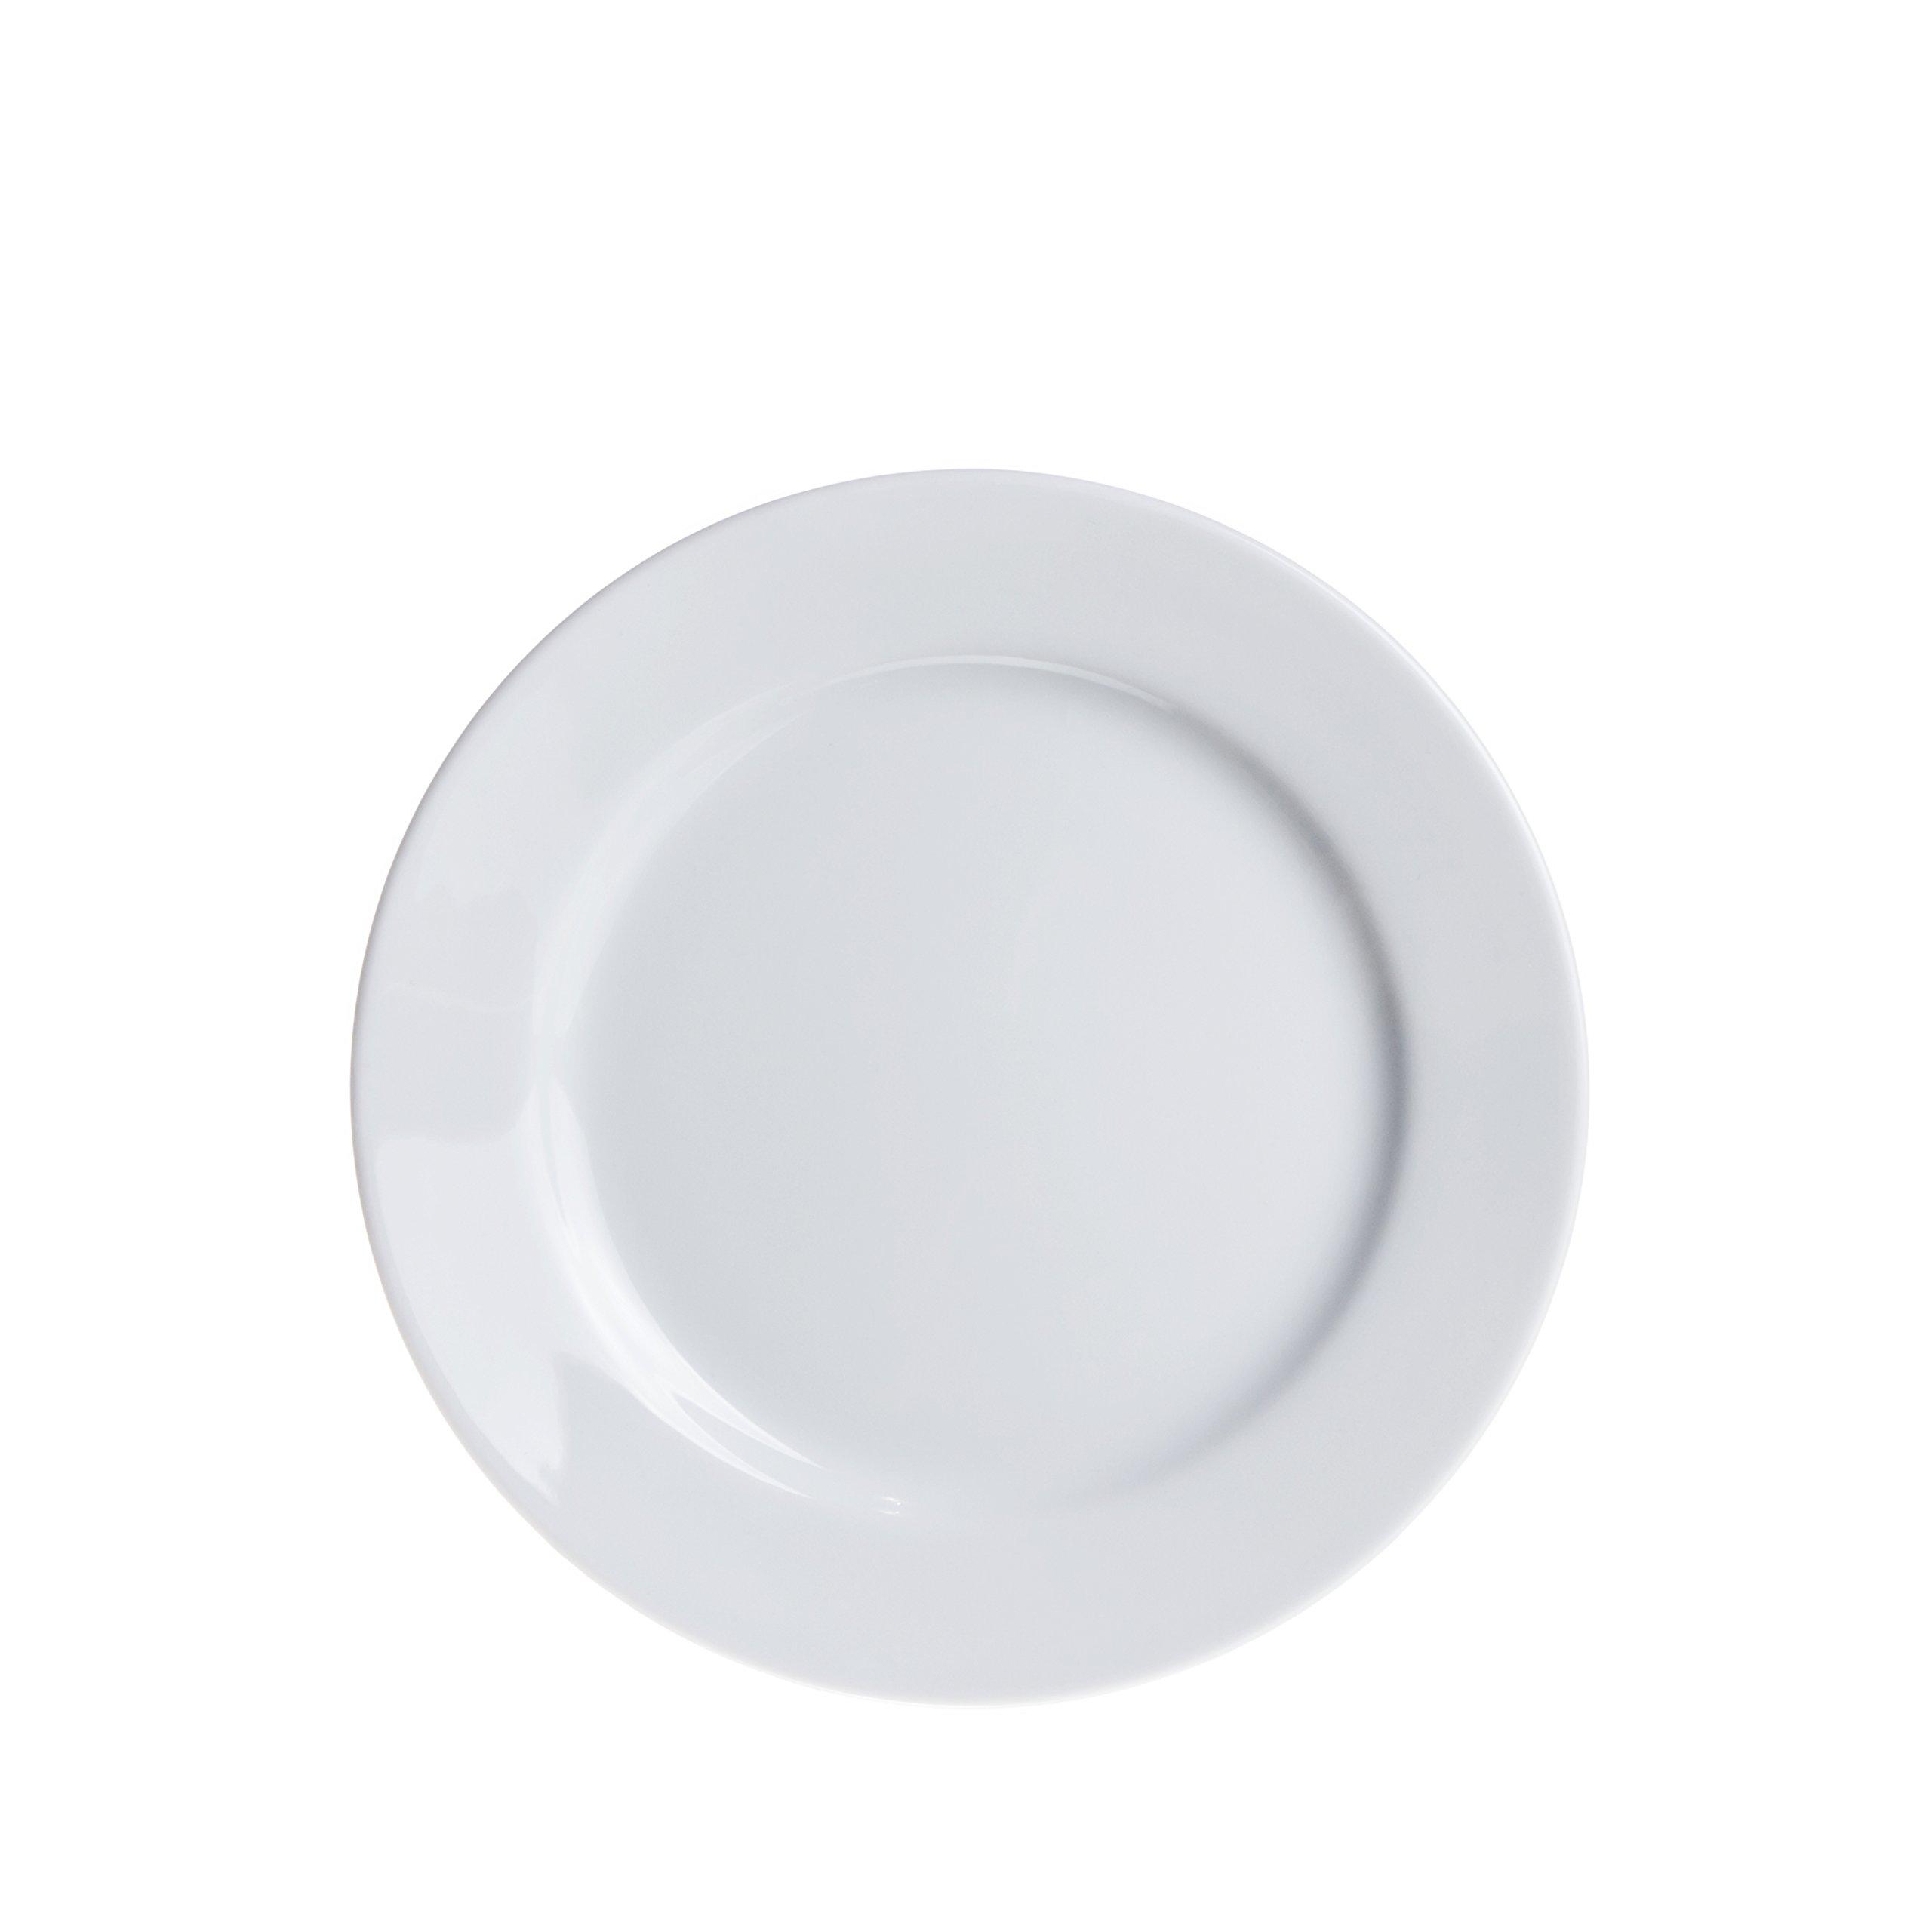 12-Piece Dinner Plates Set, Durable White Porcelain, Restaurant&Hotel Quality, 7.4''